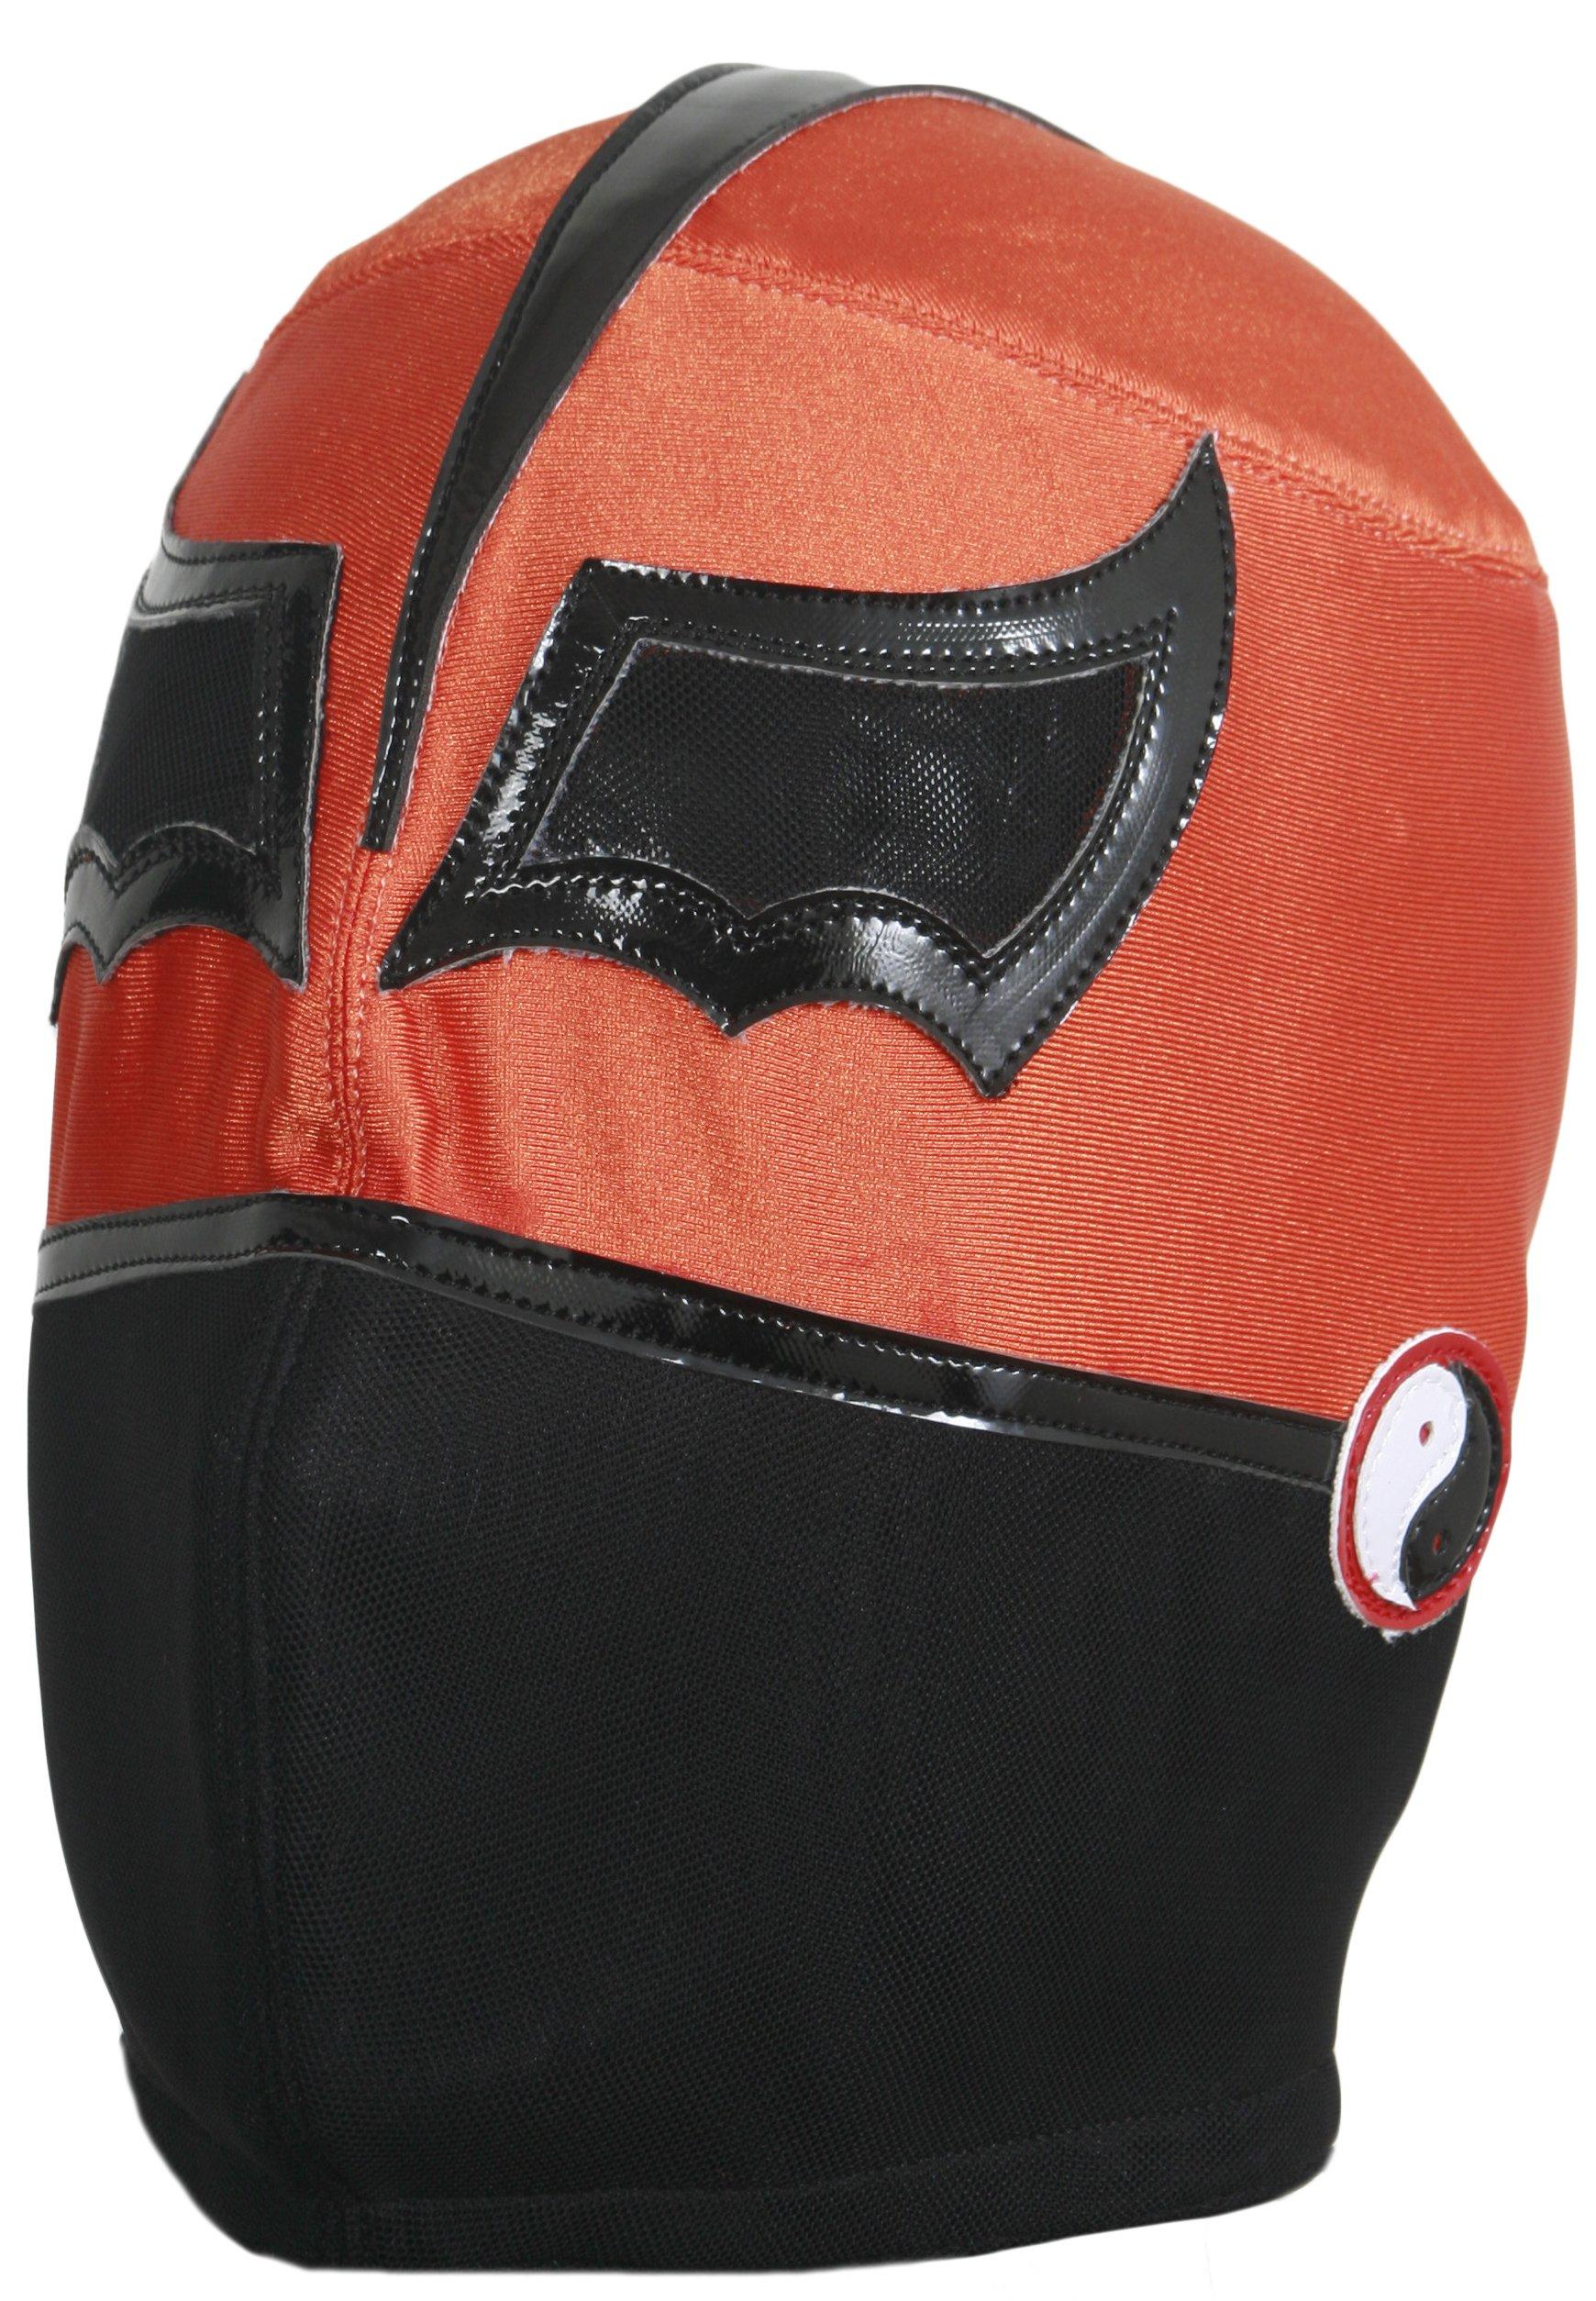 Kung Fu Professional Lucha Libre Mask Adult Luchador Mask